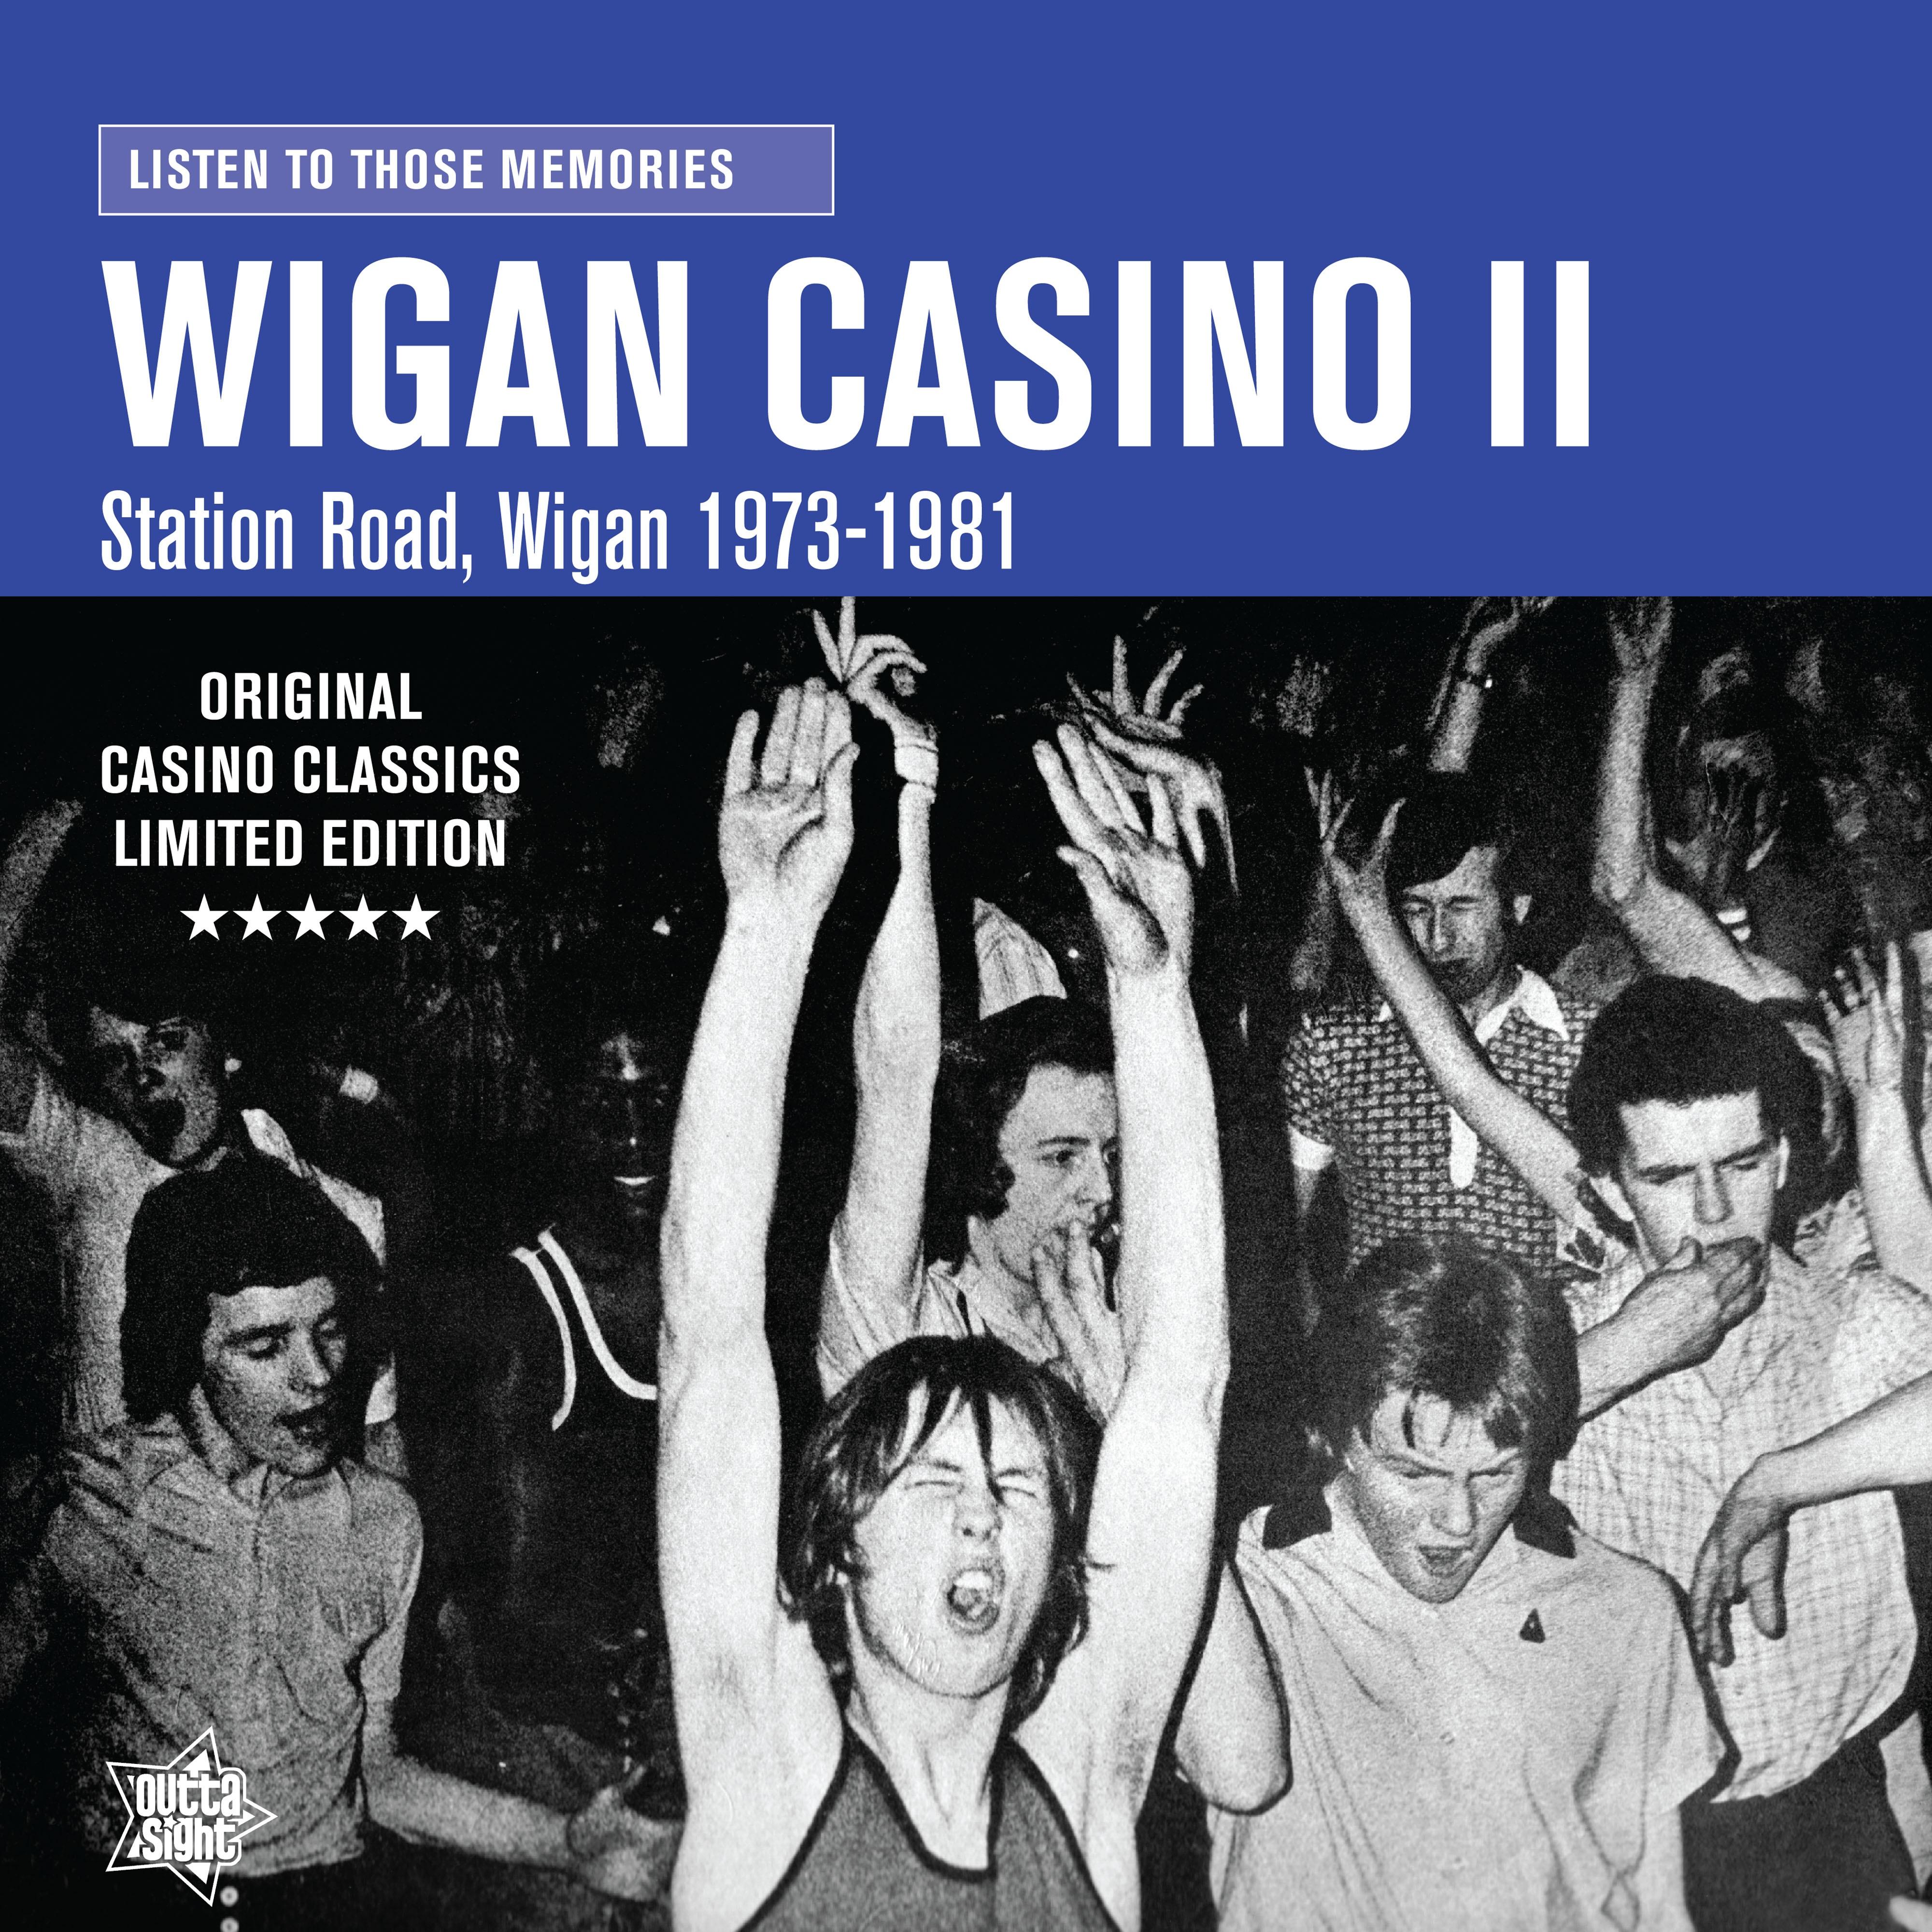 Northern Soul/WIGAN CASINO VOL 2 LP